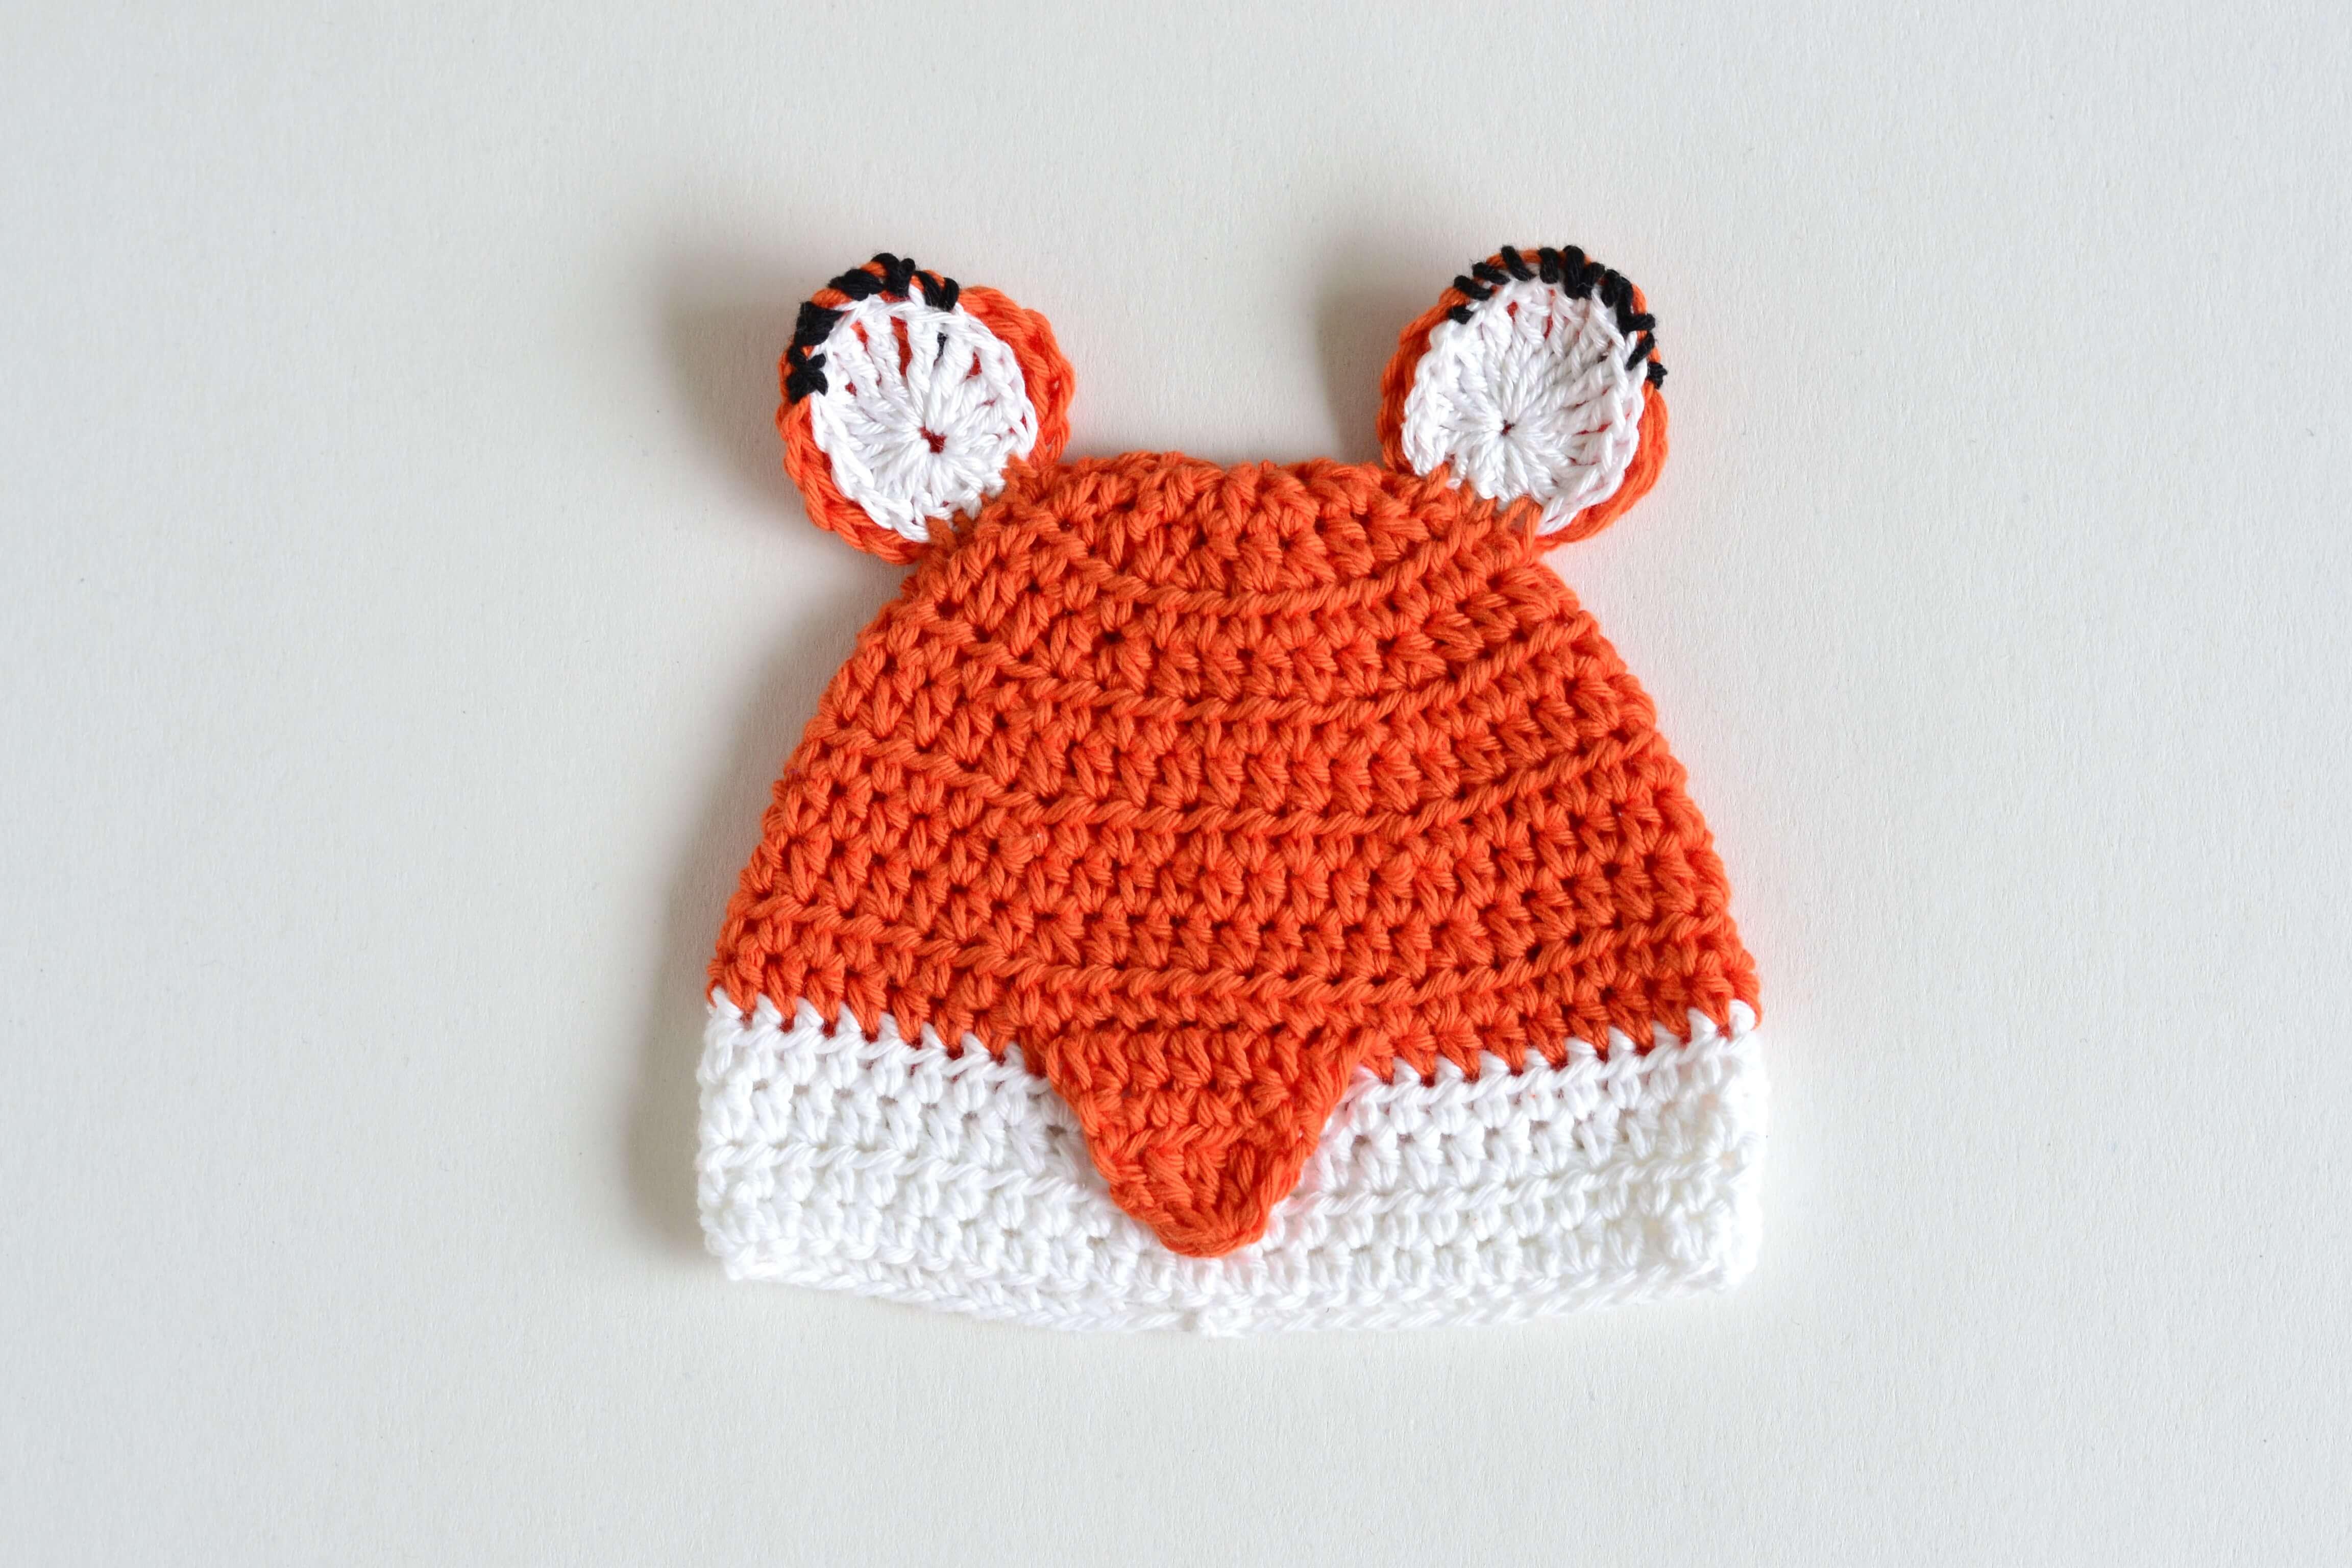 69d2a15cdc31a Croby Patterns - FREE Crochet Pattern - Cute Fox